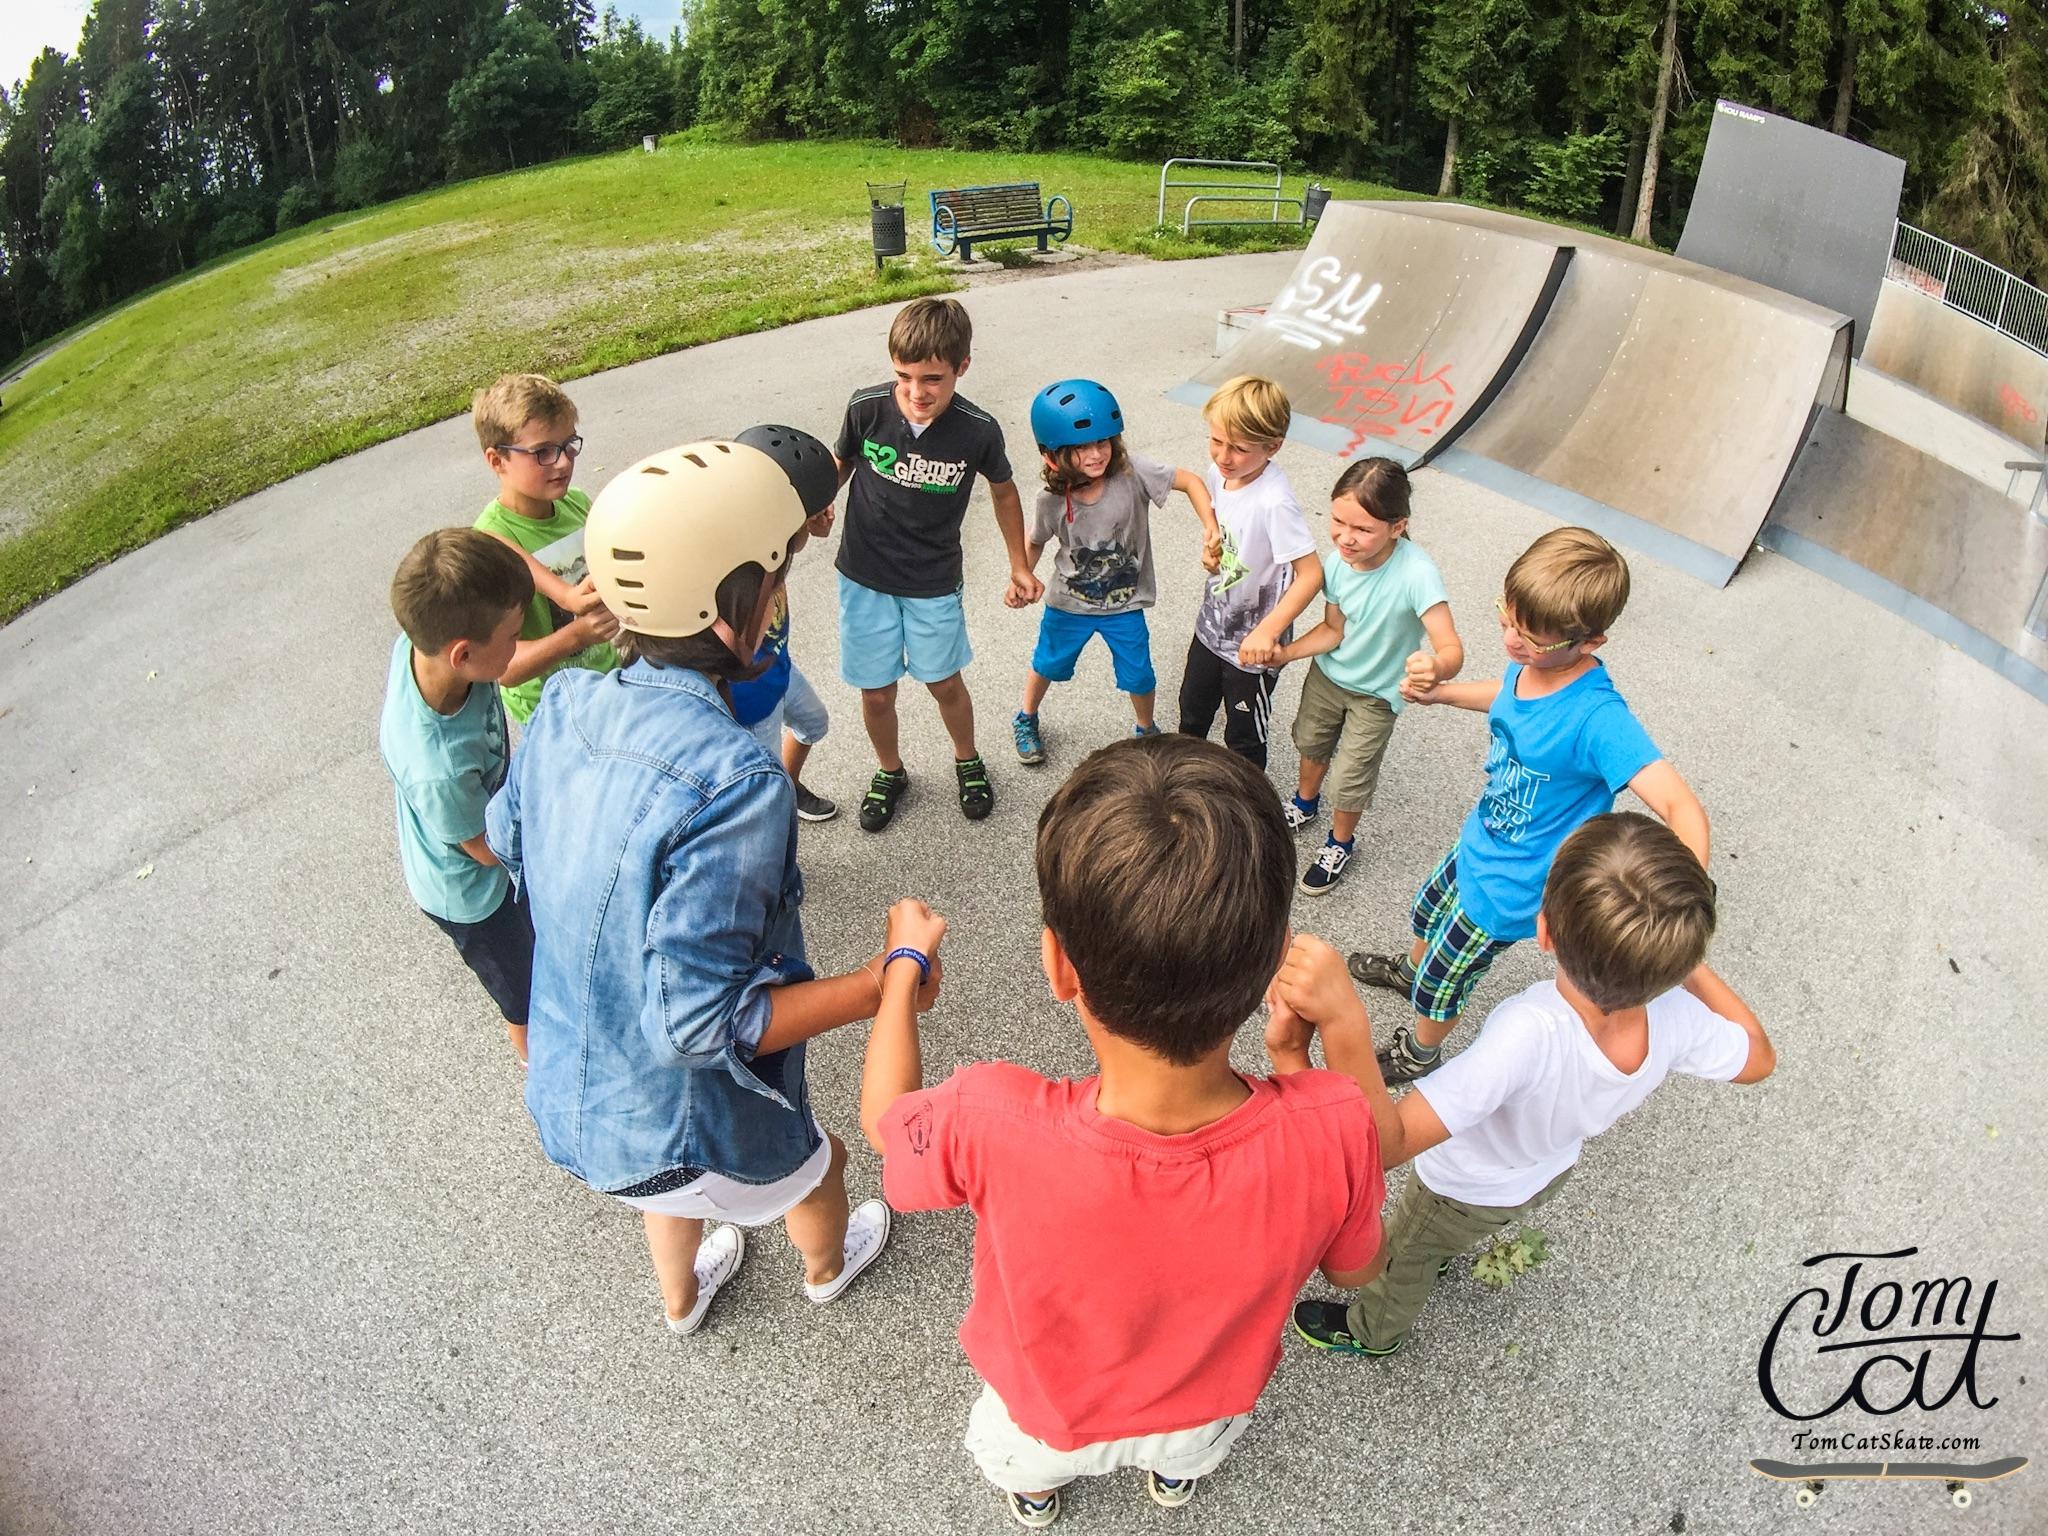 Skaten lernen Skateboard Kurs München Deutschland Skateschule Skateboardschool.JPG